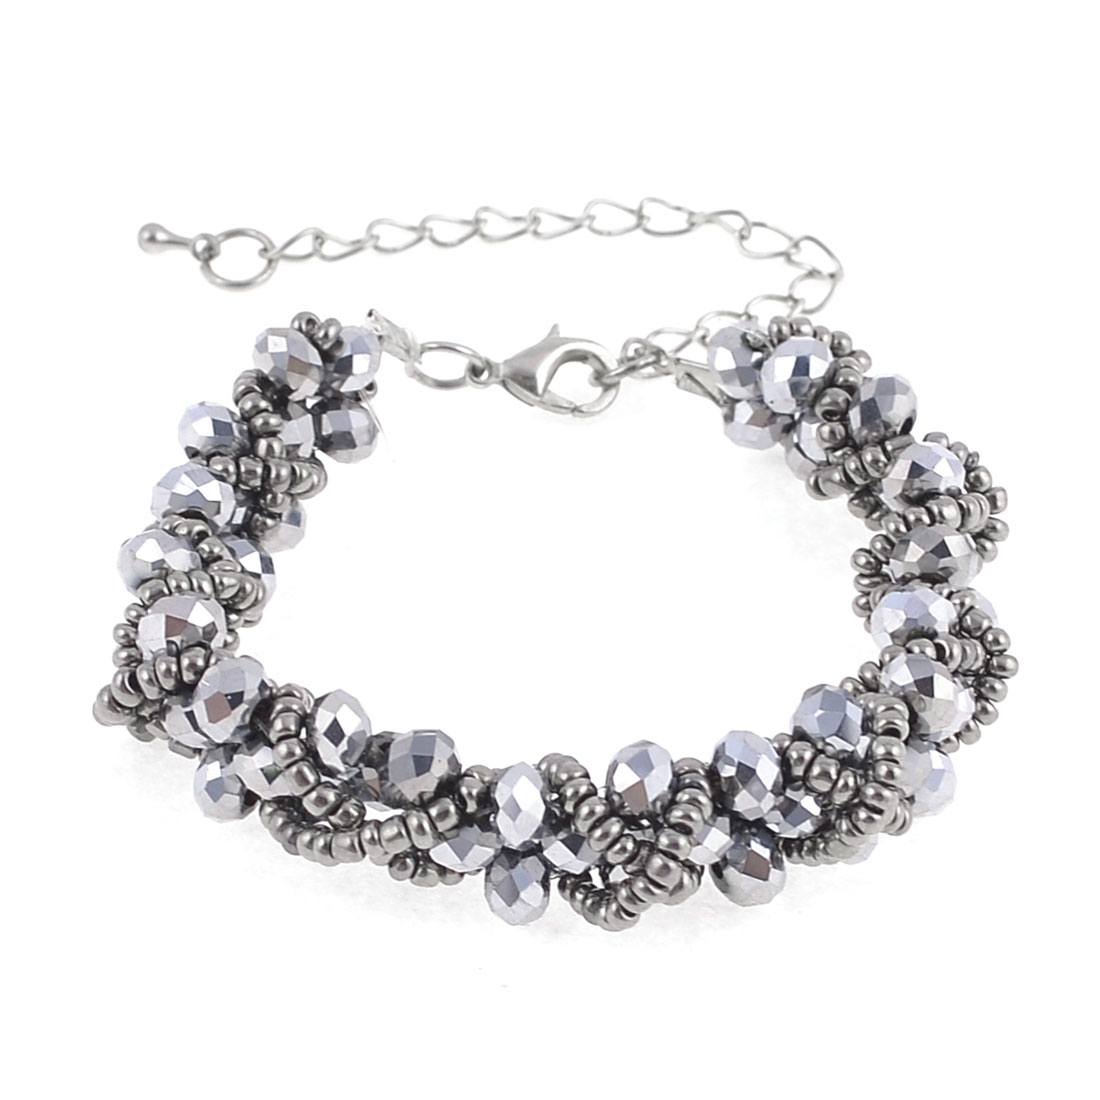 Lady Lobster Hook Silver Tone Plastic Beads Decor Chain Bracelet